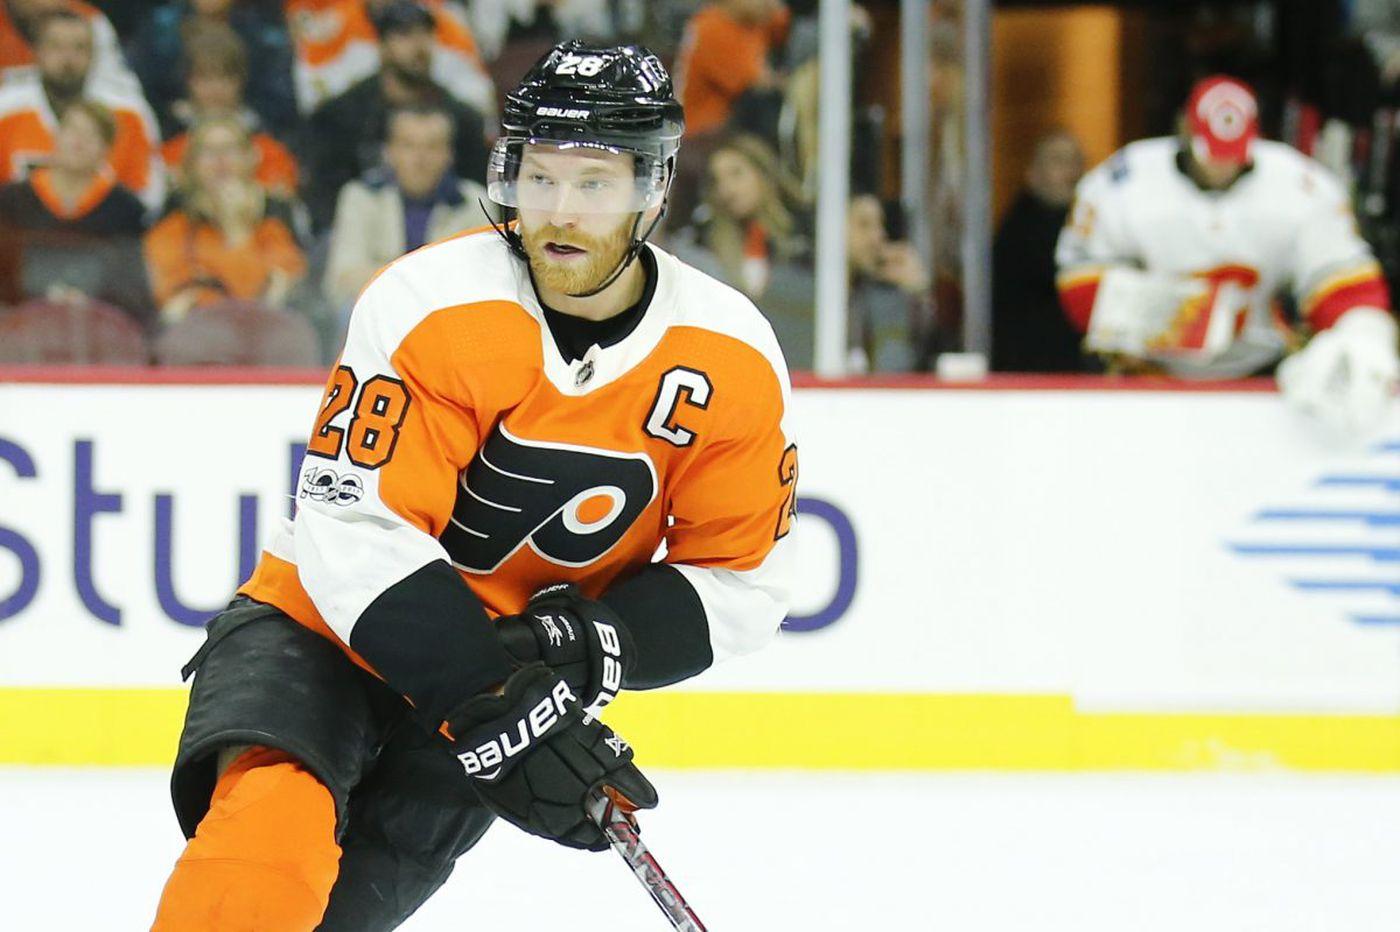 Claude Giroux, Morgan Frost, and Travis Konecny lead Flyers to 5-3 win in Carolina